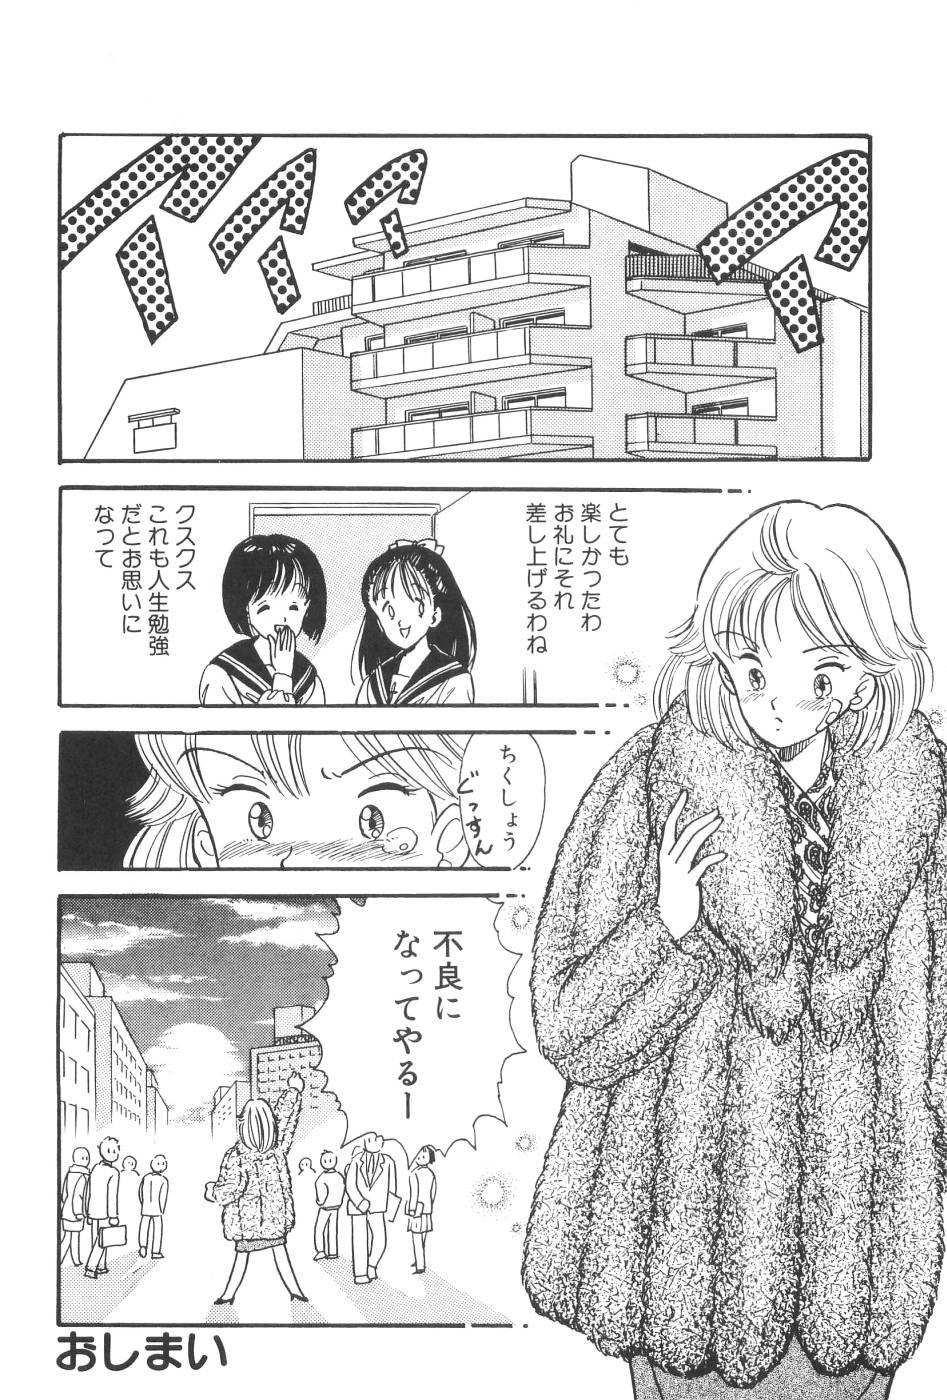 Namioto Densetsu 129